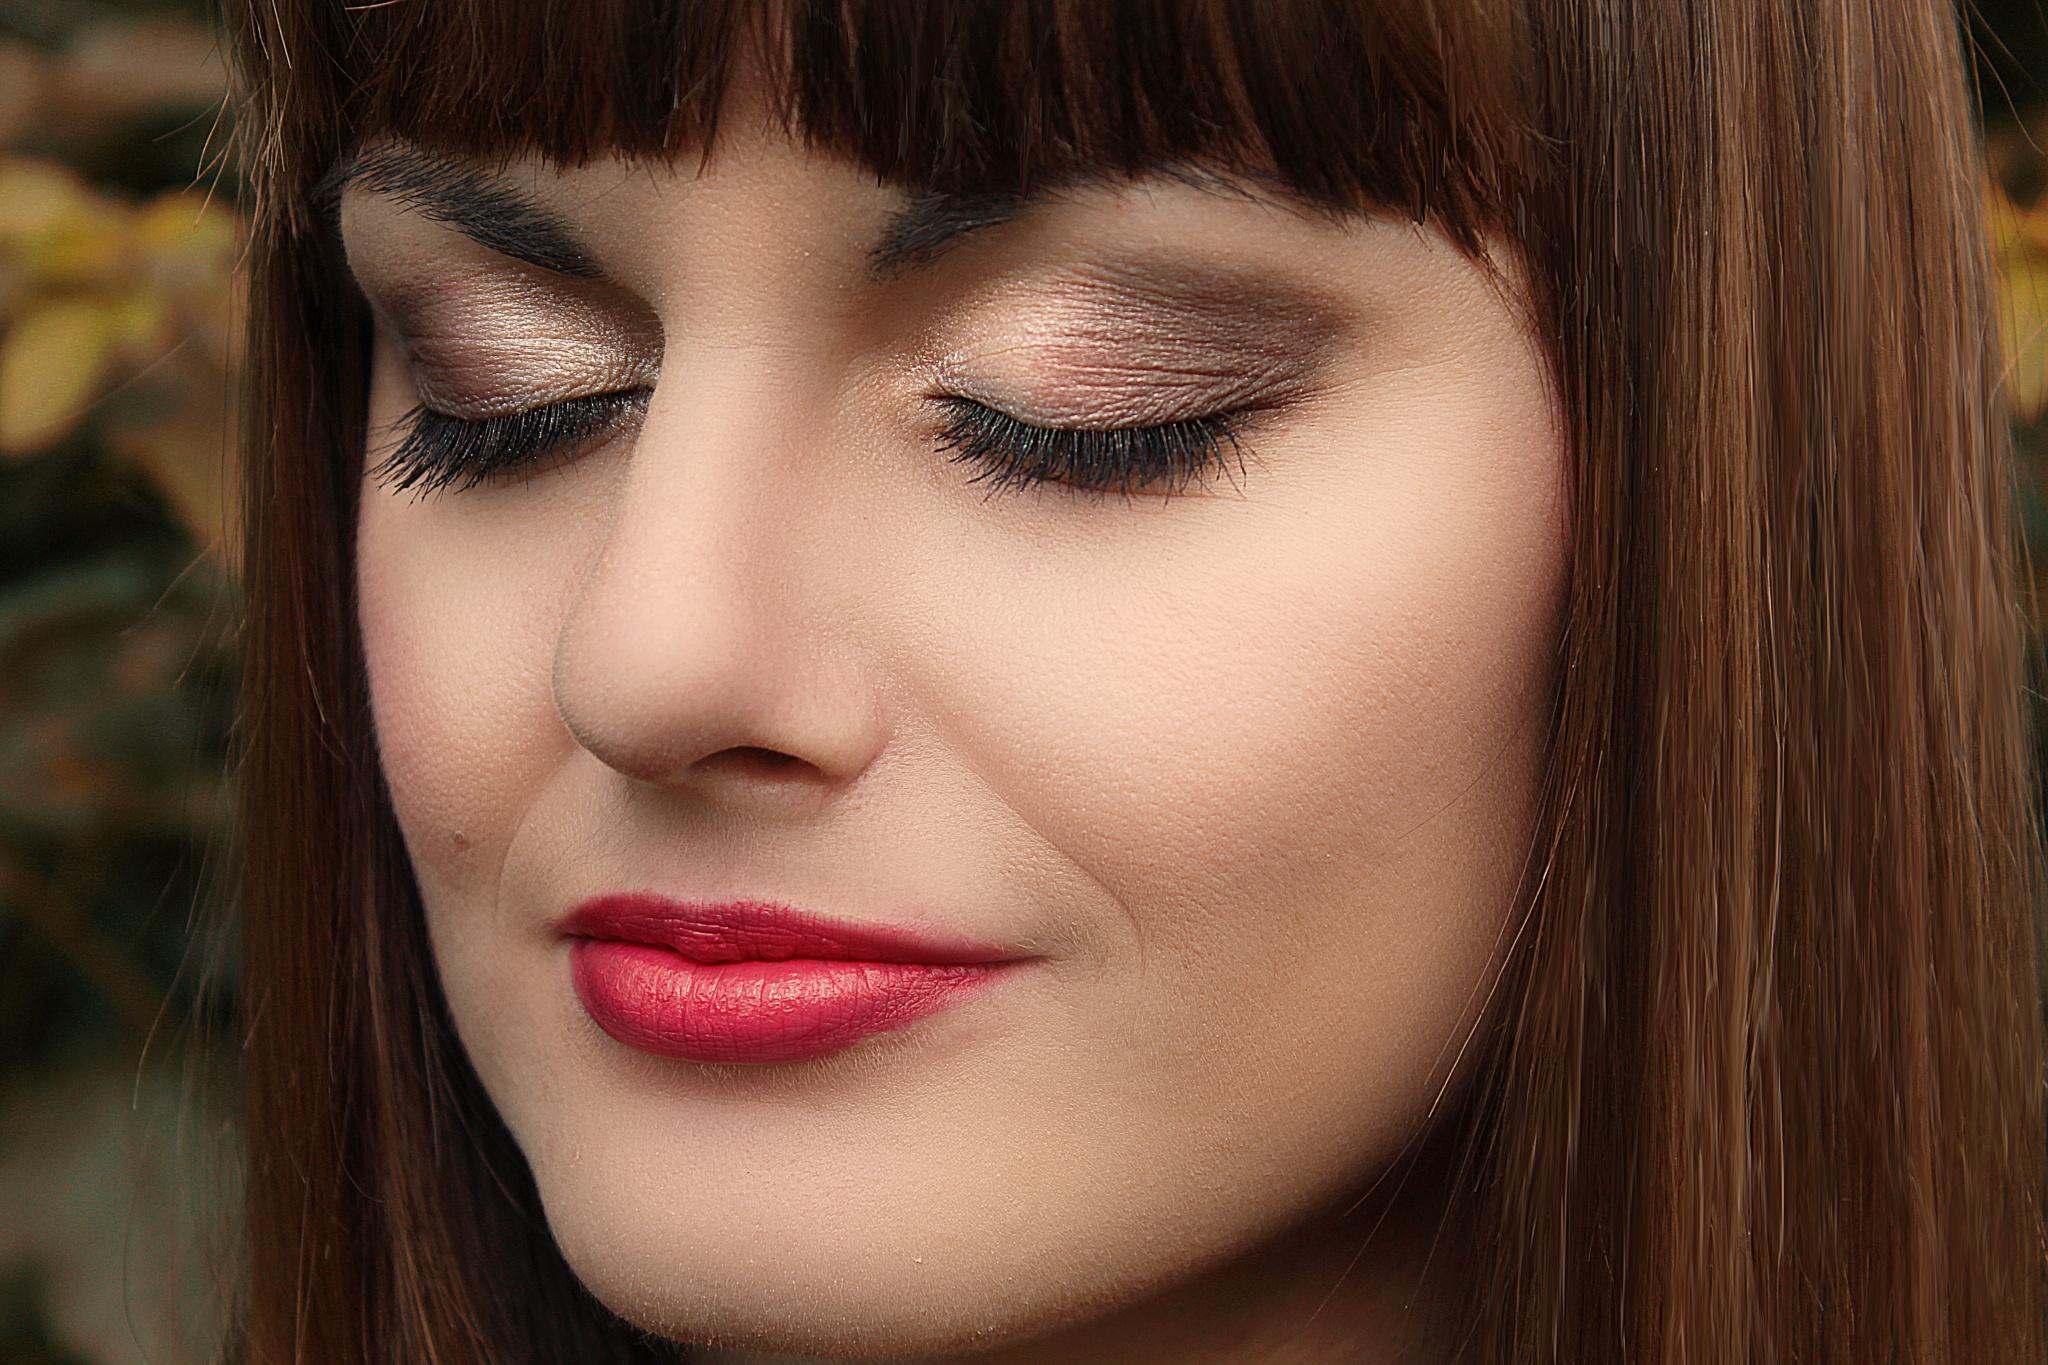 Make up by Oliana Gruzdeva